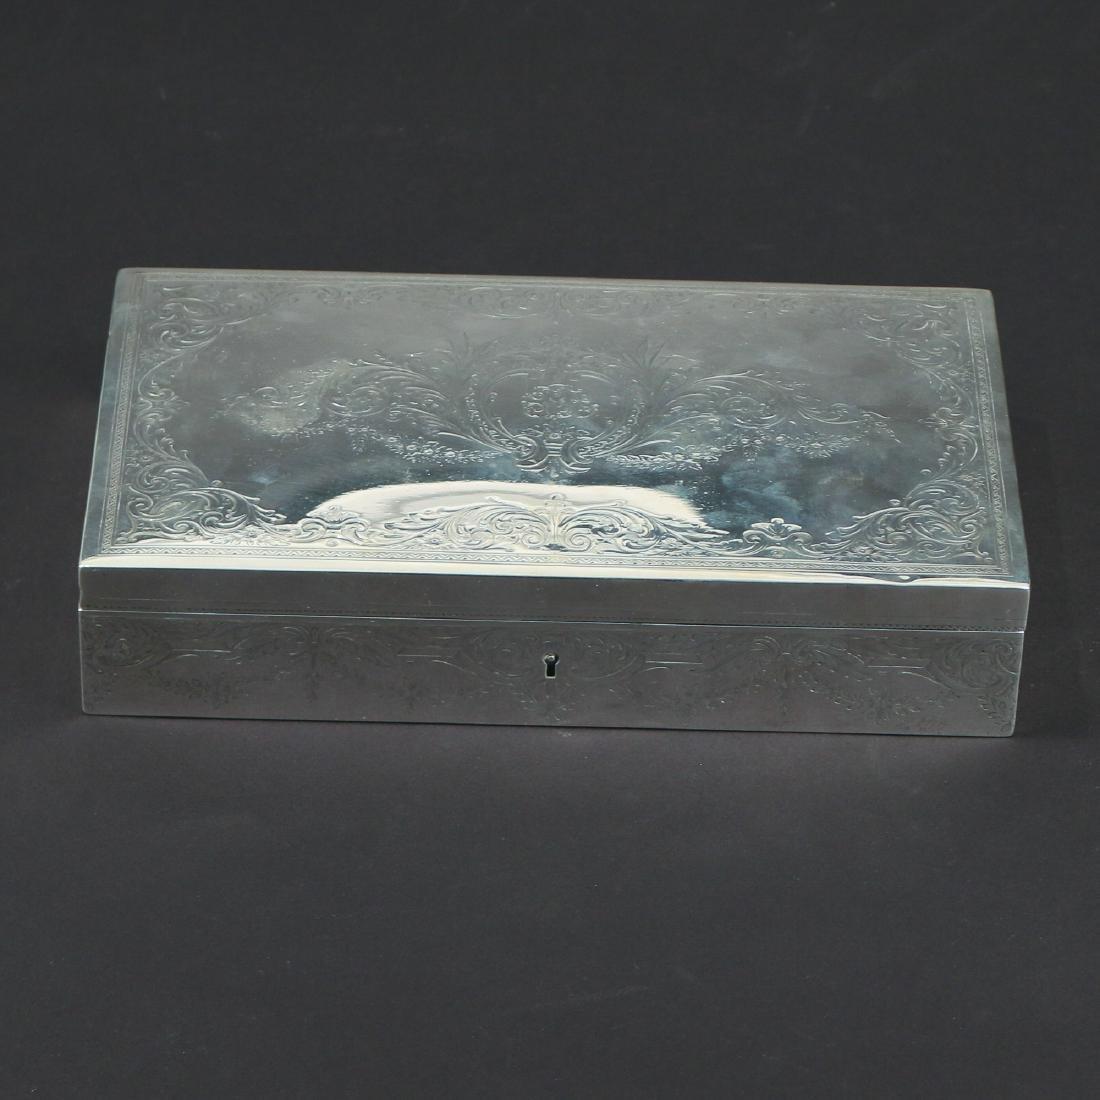 HOWARD & CO. STERLING SILVER JEWELRY BOX - 2